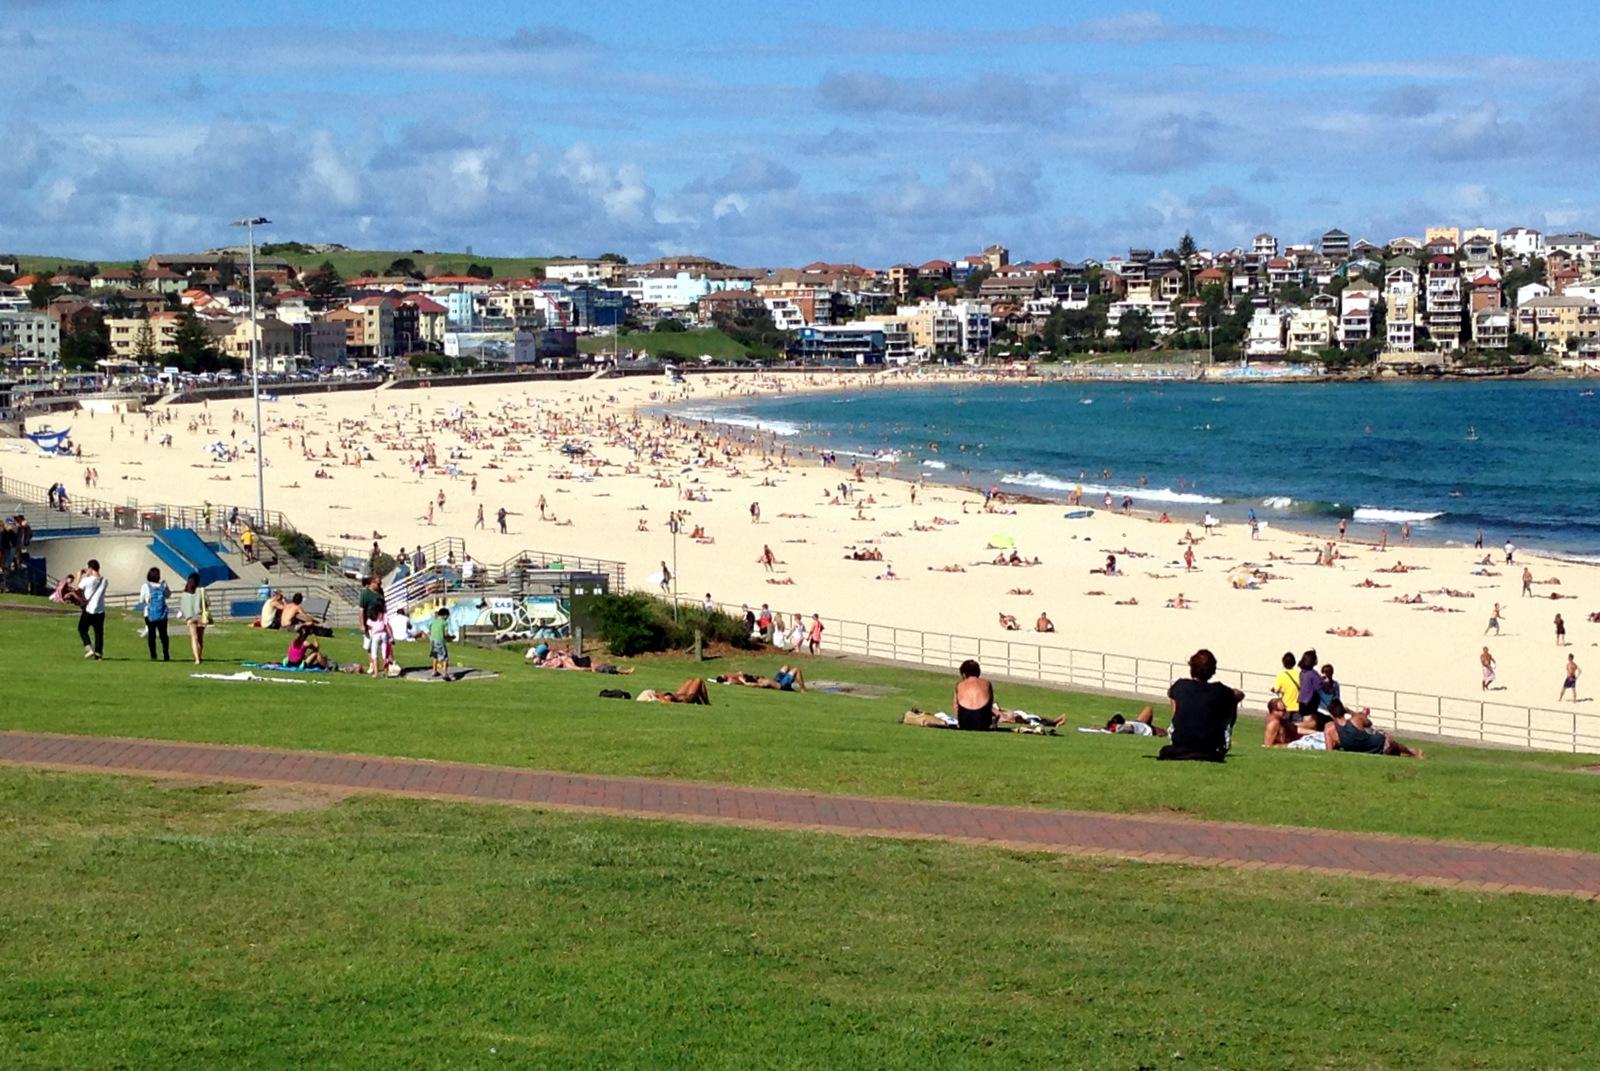 praias da australia: Bondi Beach